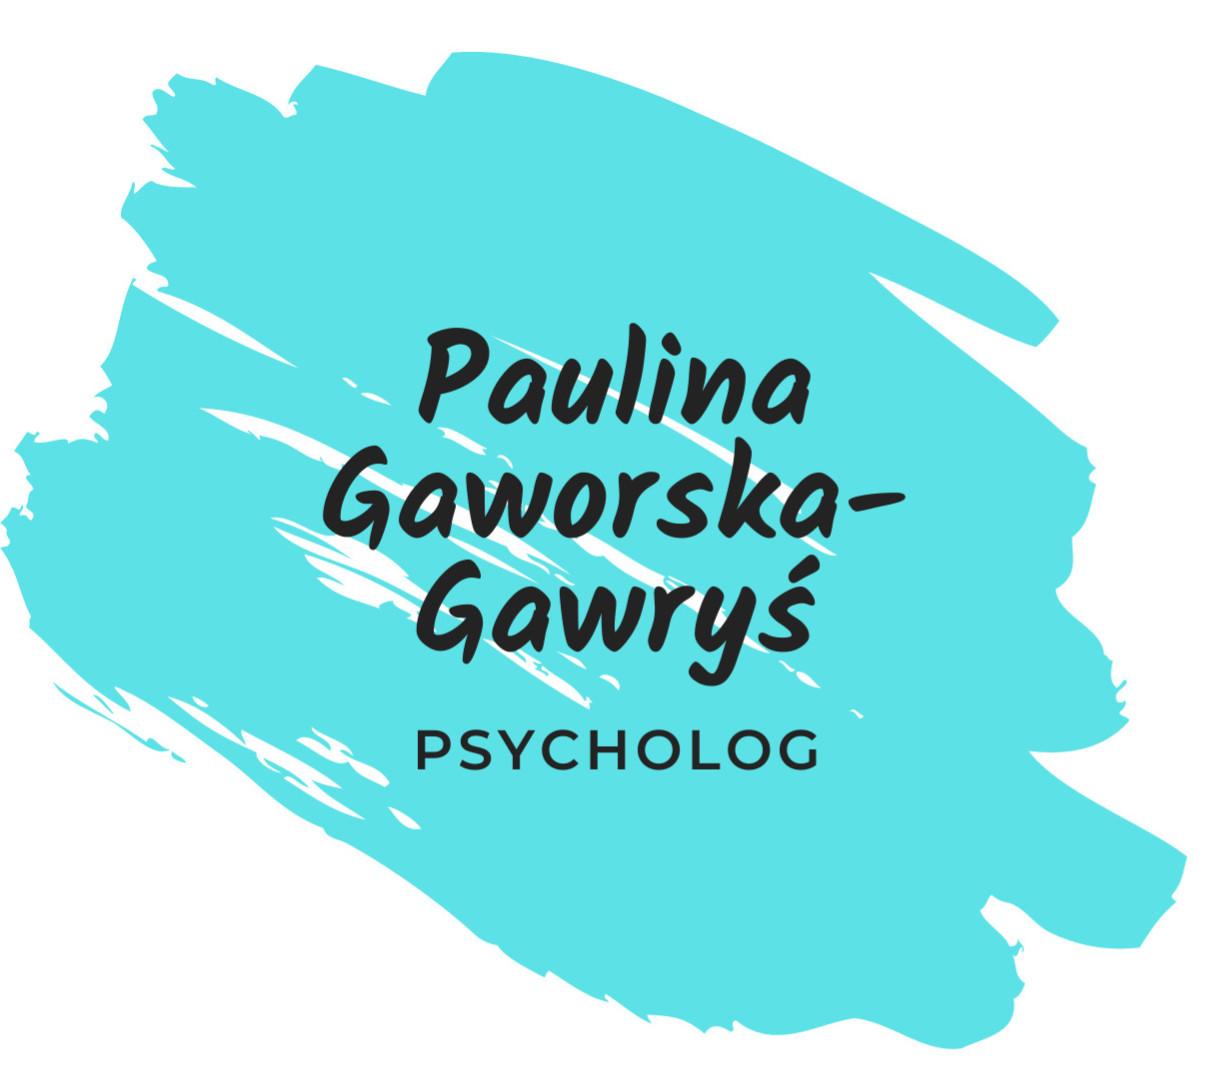 Paulina Gaworska-Gawryś